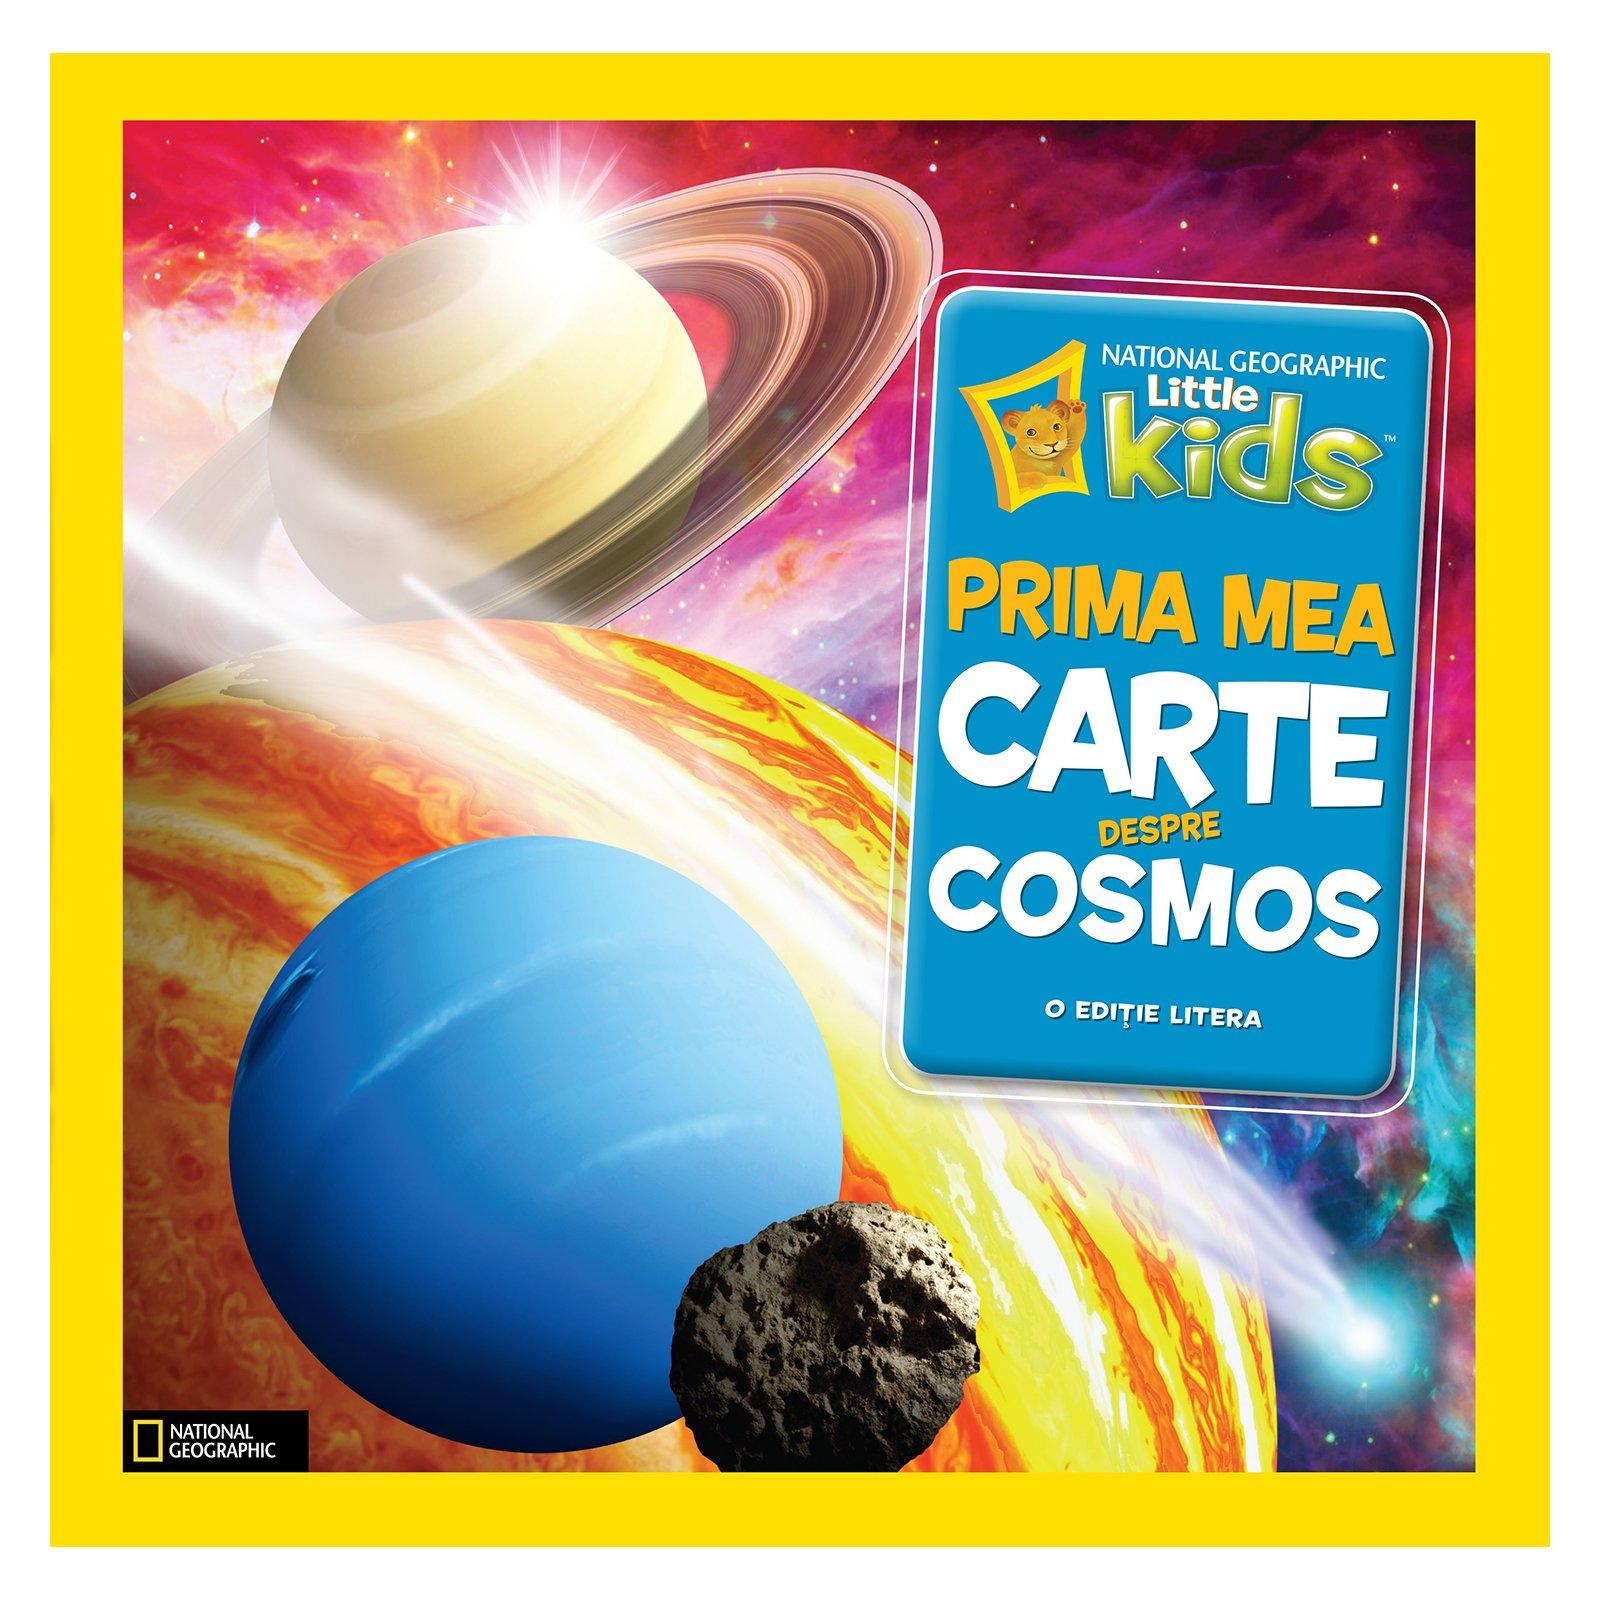 national geographic little kids - prima mea carte despre cosmos